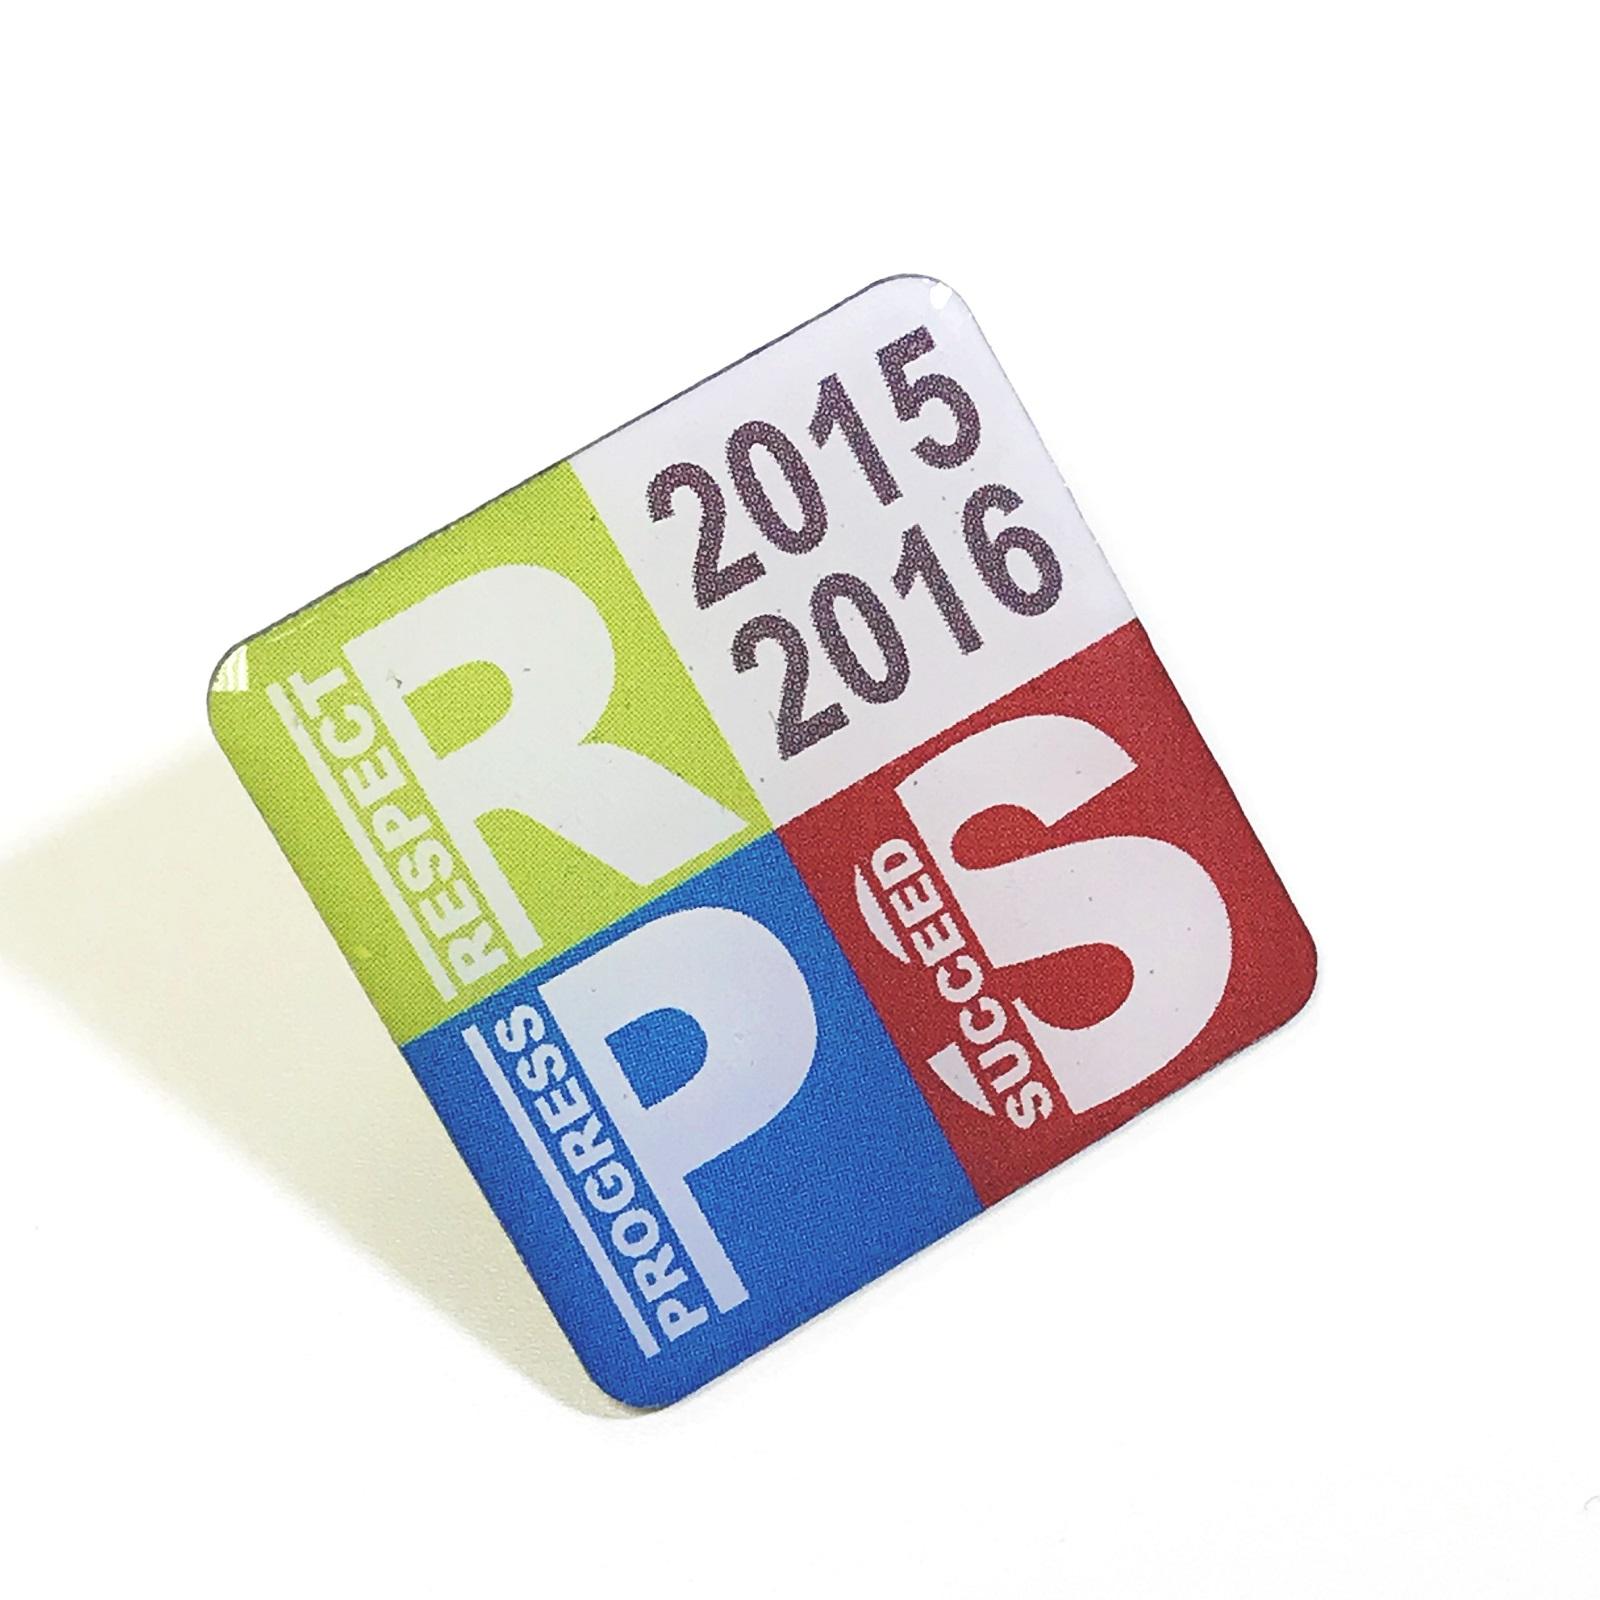 Printed Badges   Metal & Aluminium Badges - i4c Publicity Ltd